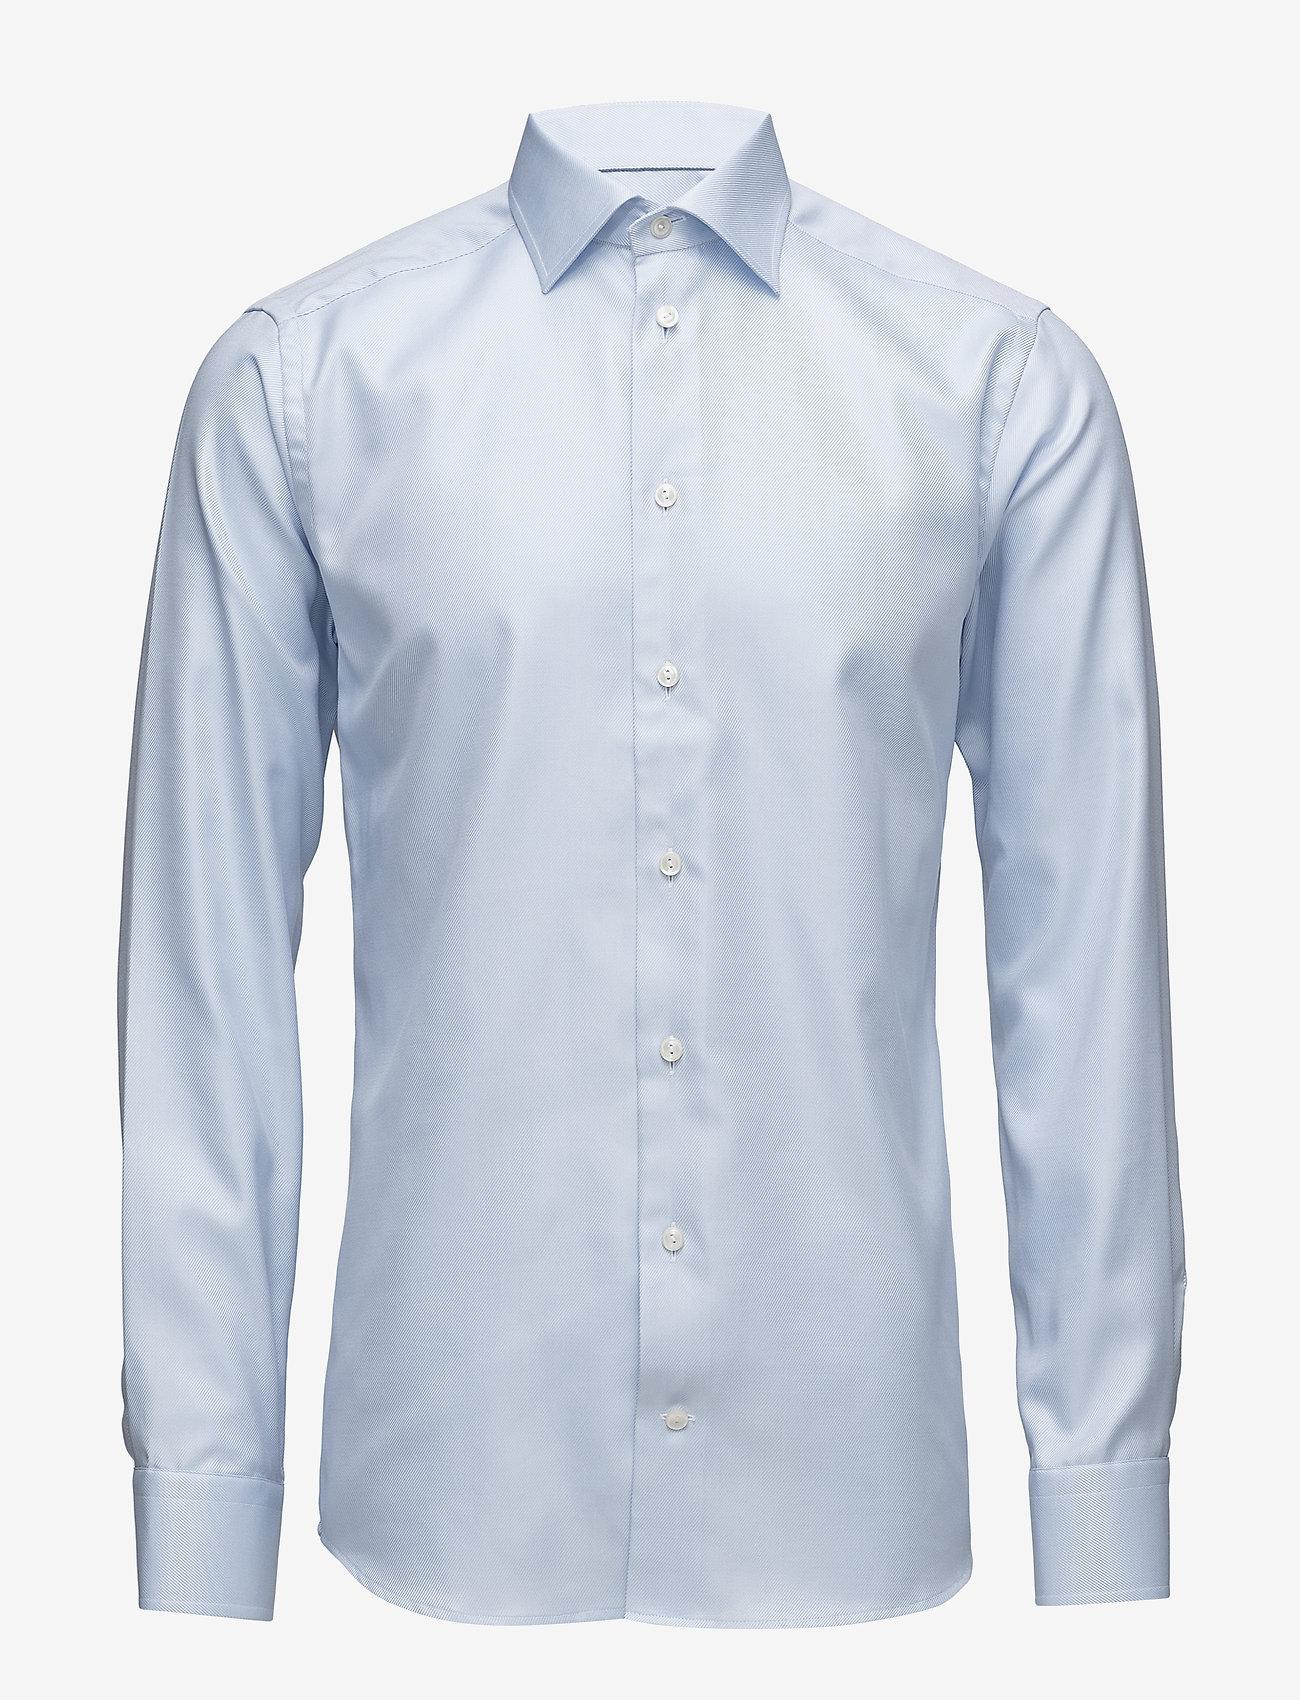 Eton - Harrogate-Collection-Slim fit - lina krekli - blue - 0